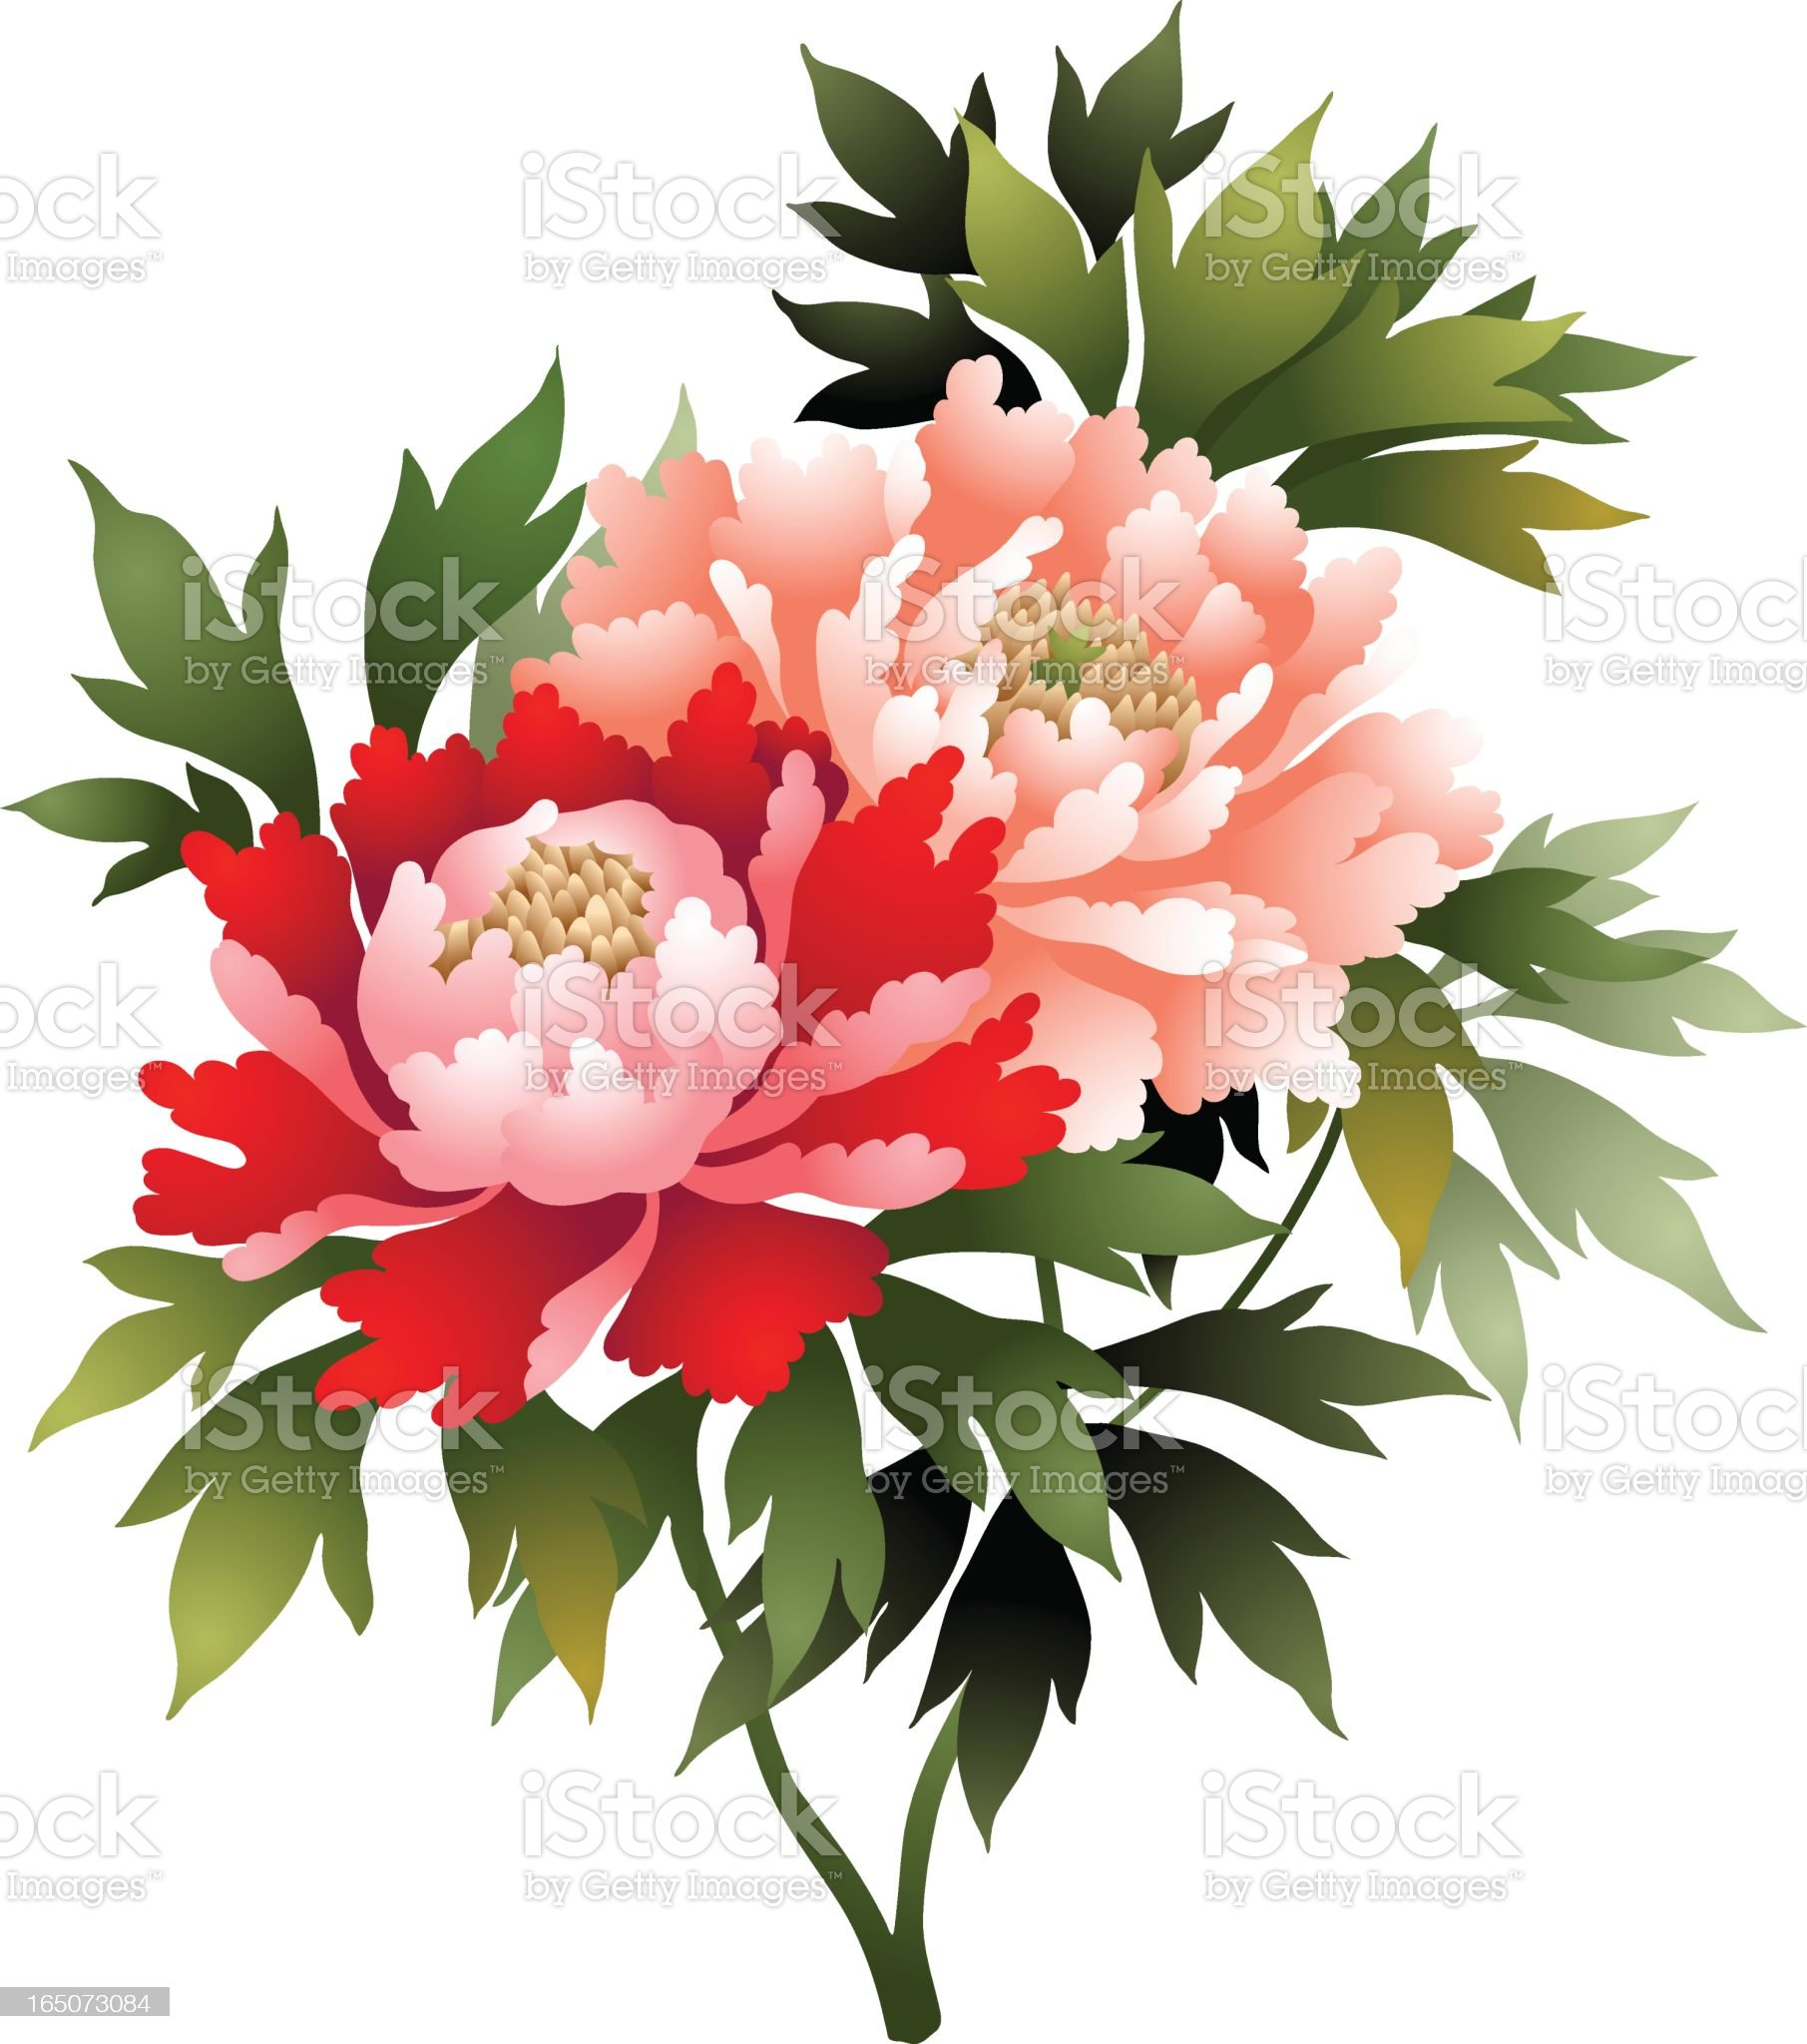 Peony flower illustration royalty-free stock vector art